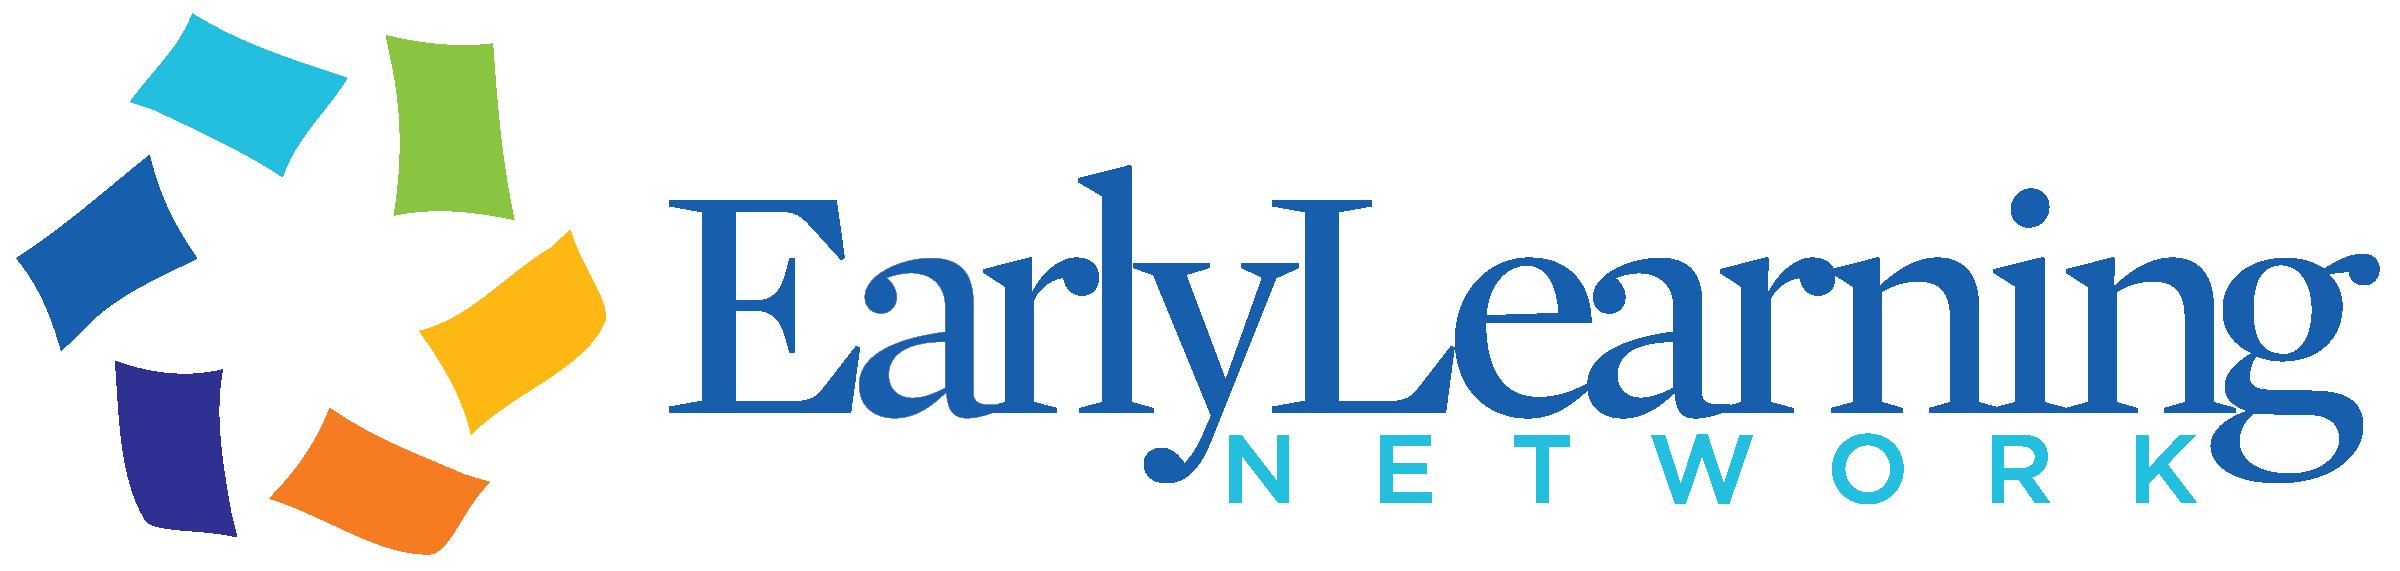 Early Learning Network logo